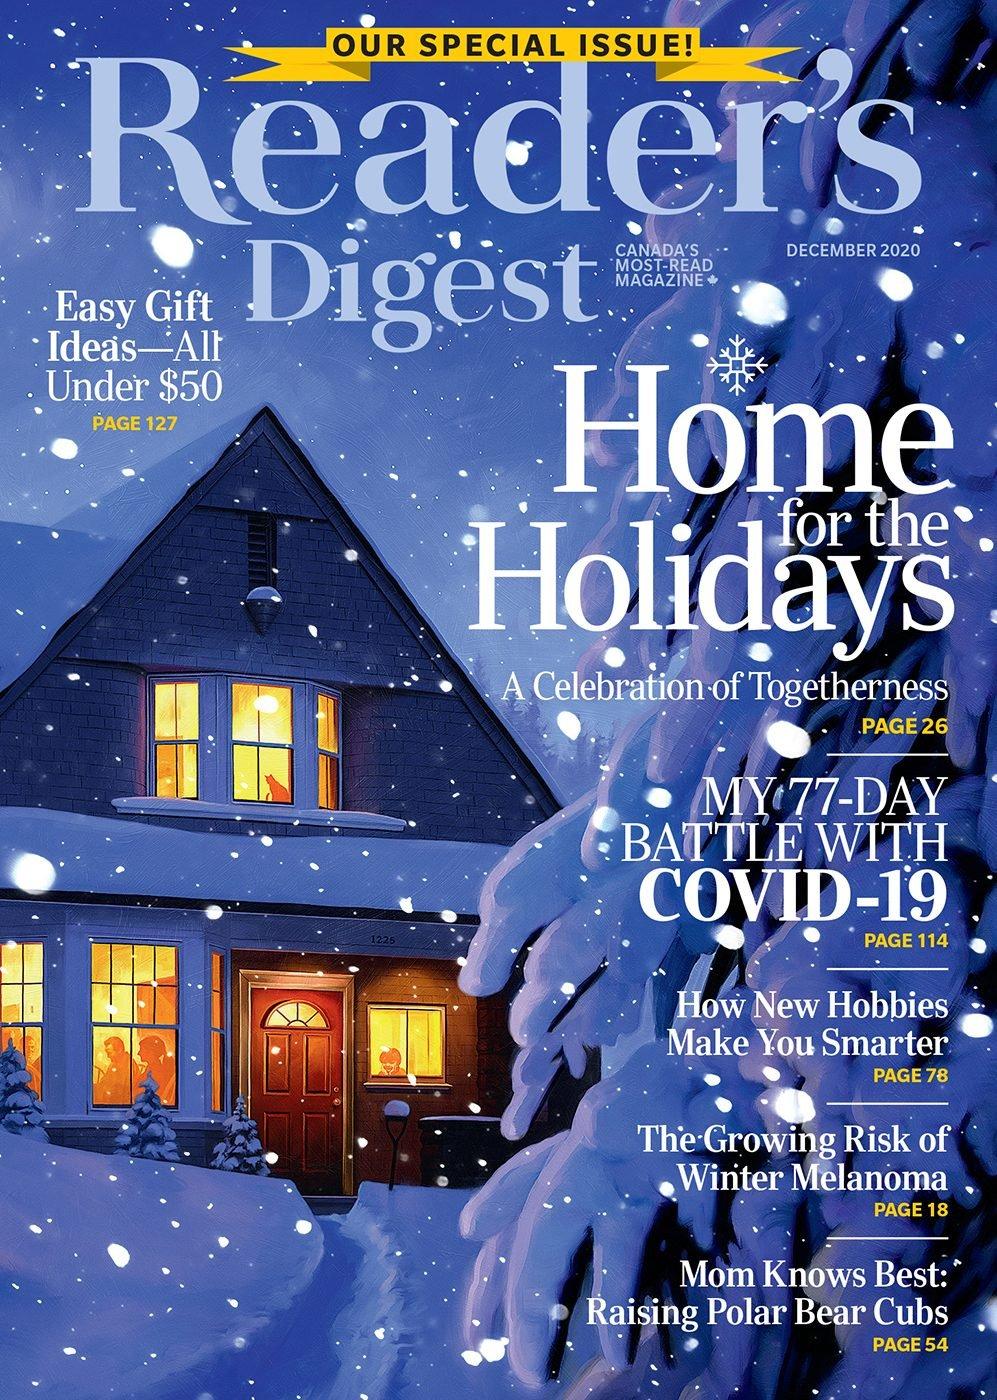 Reader's Digest Canada - December 2020 cover